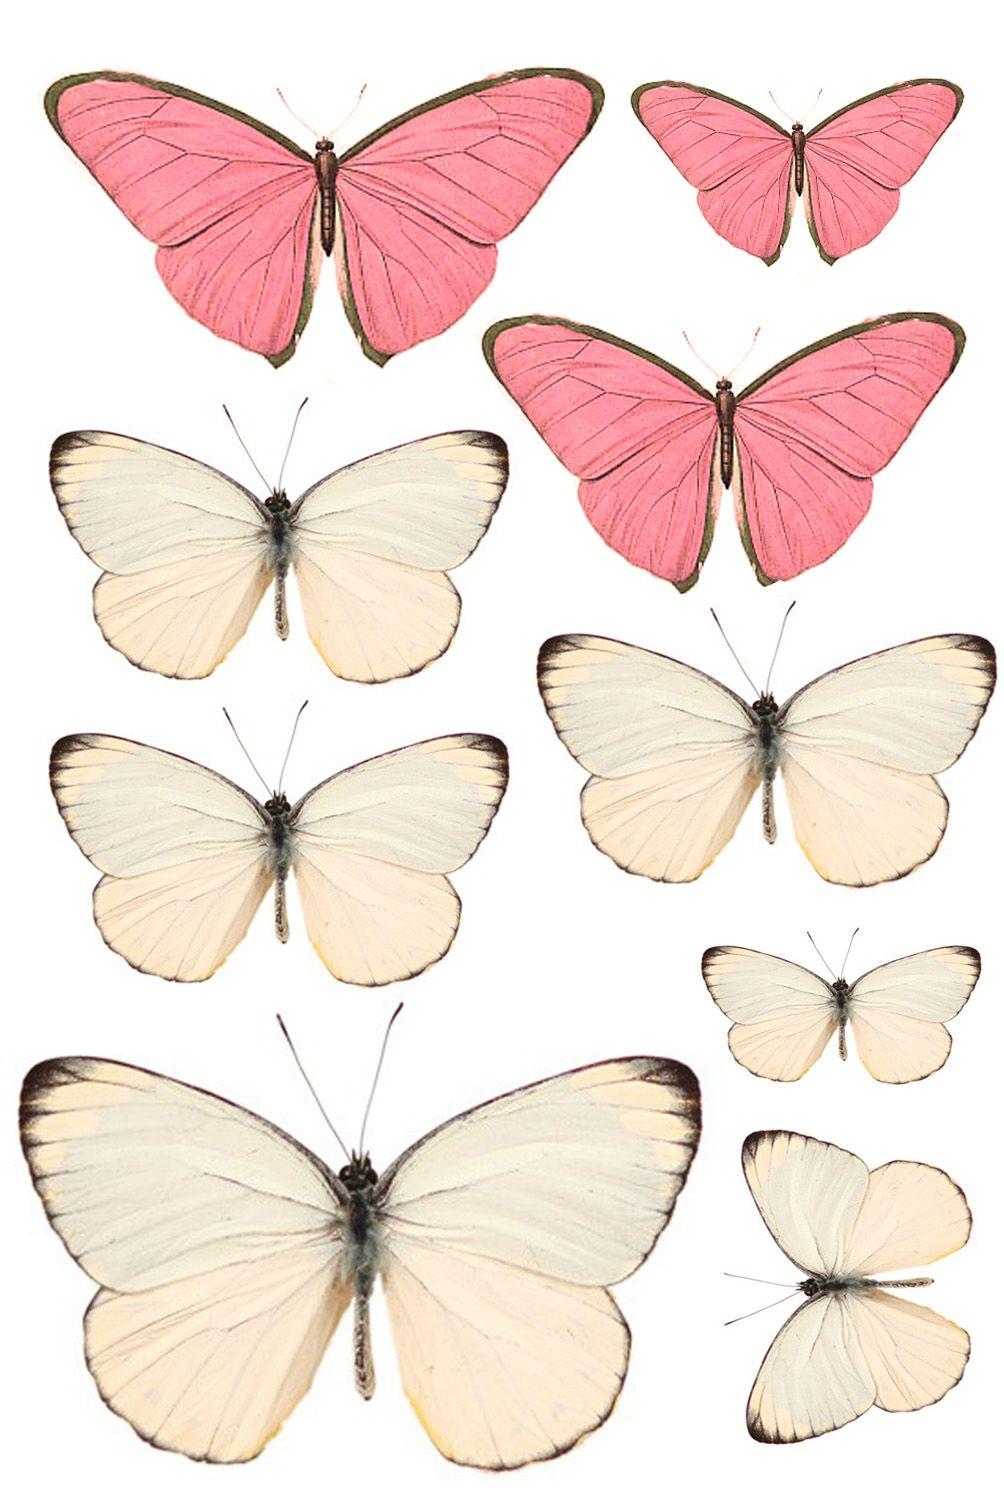 mariposas rosadas | decoupage | Pinterest | Mariposa rosa, Mariposas ...